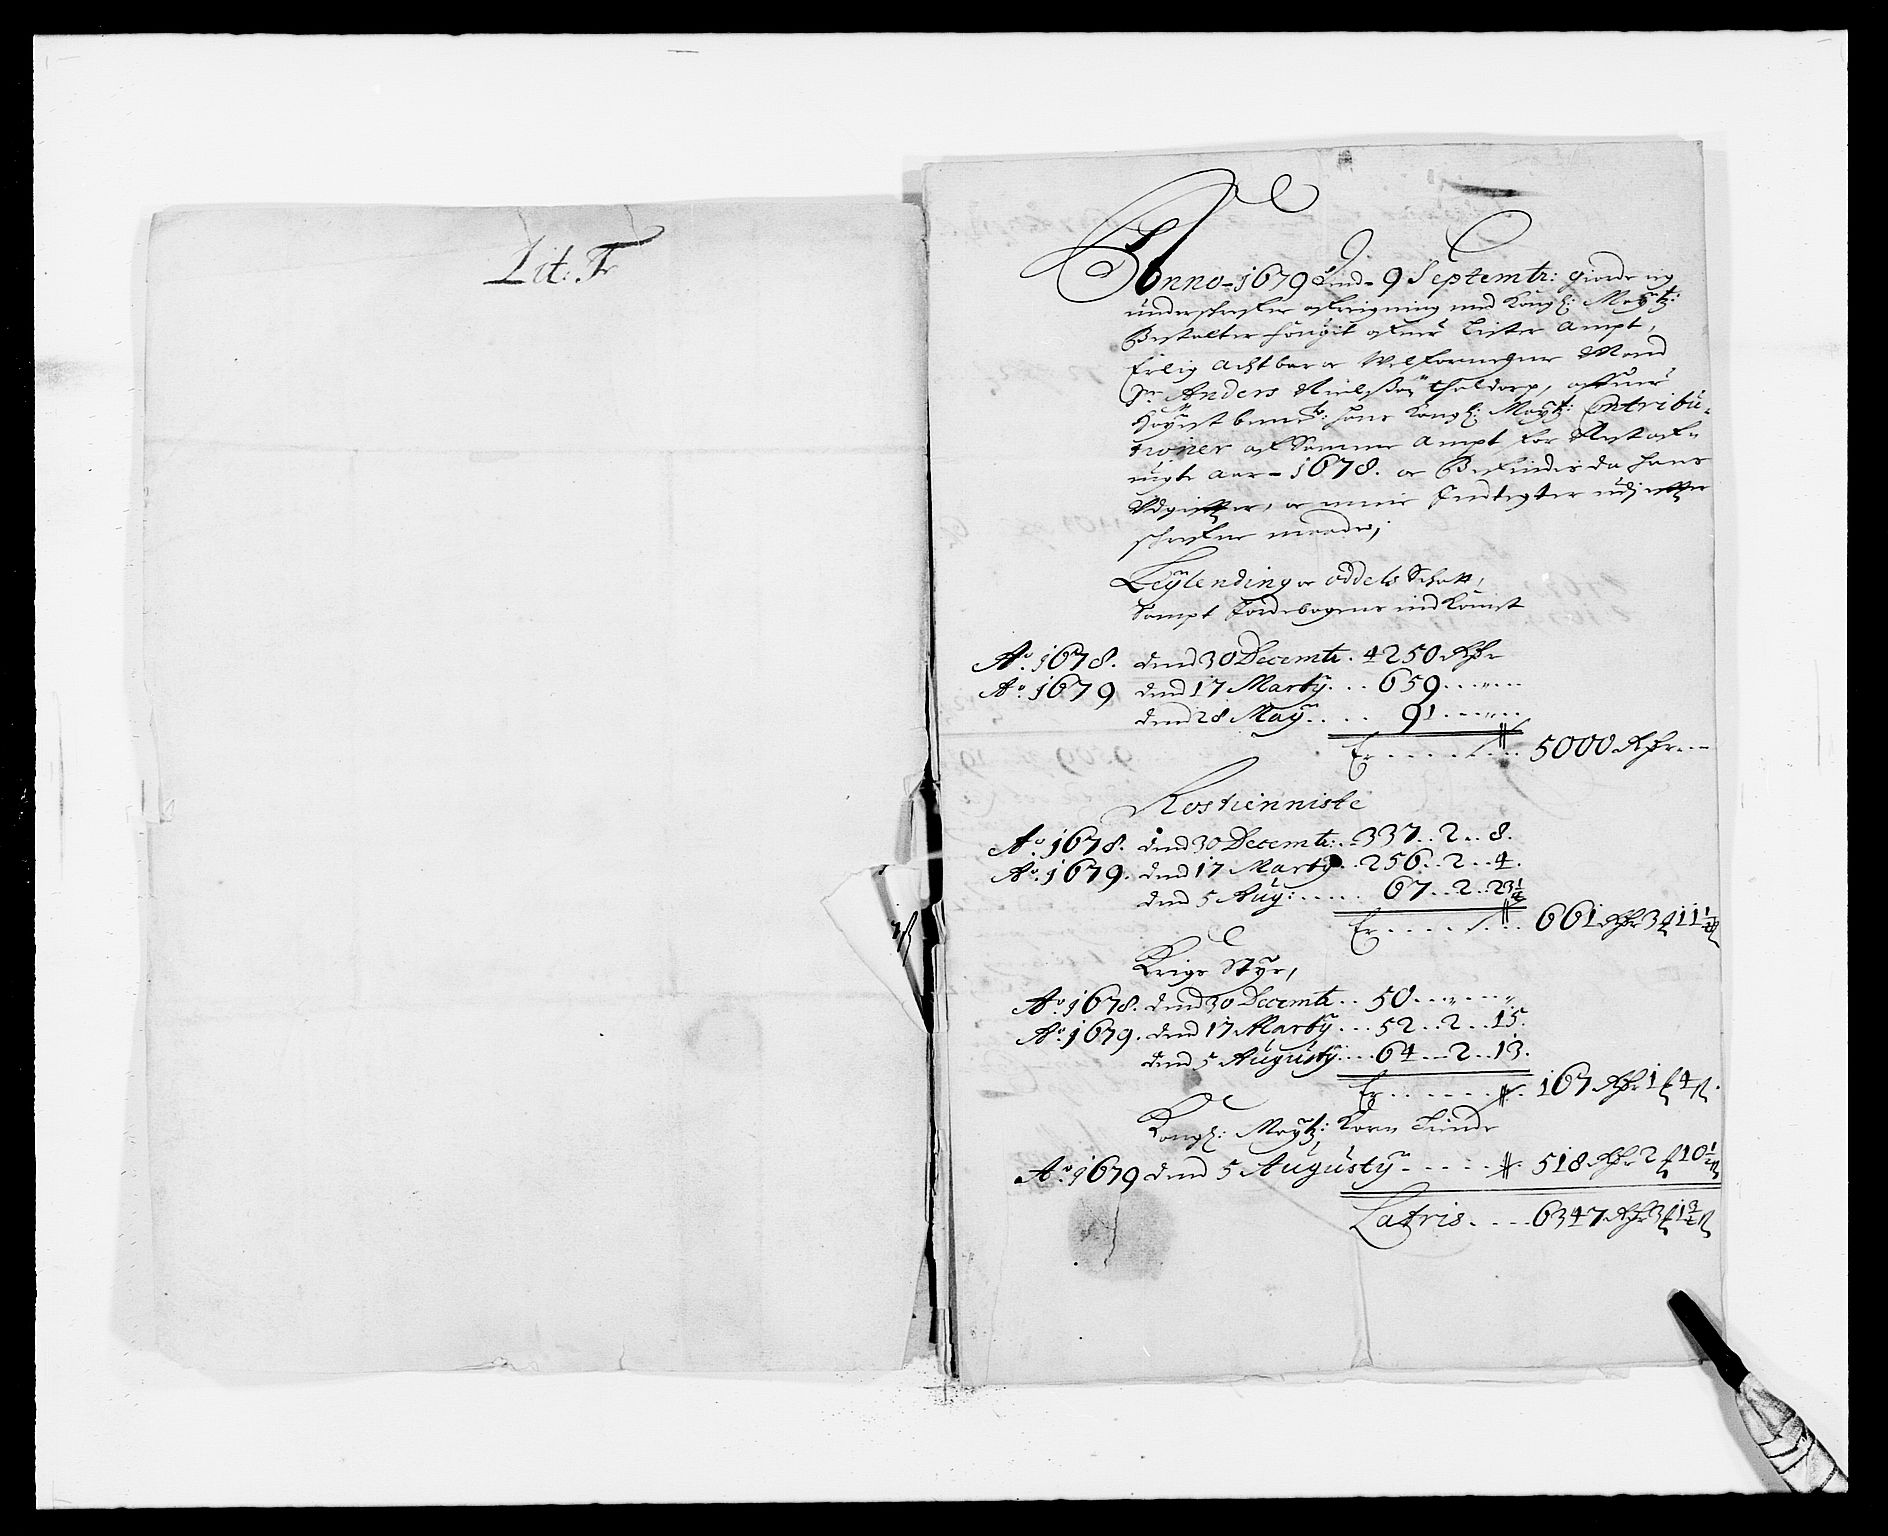 RA, Rentekammeret inntil 1814, Reviderte regnskaper, Fogderegnskap, R41/L2530: Fogderegnskap Lista, 1677-1679, s. 294